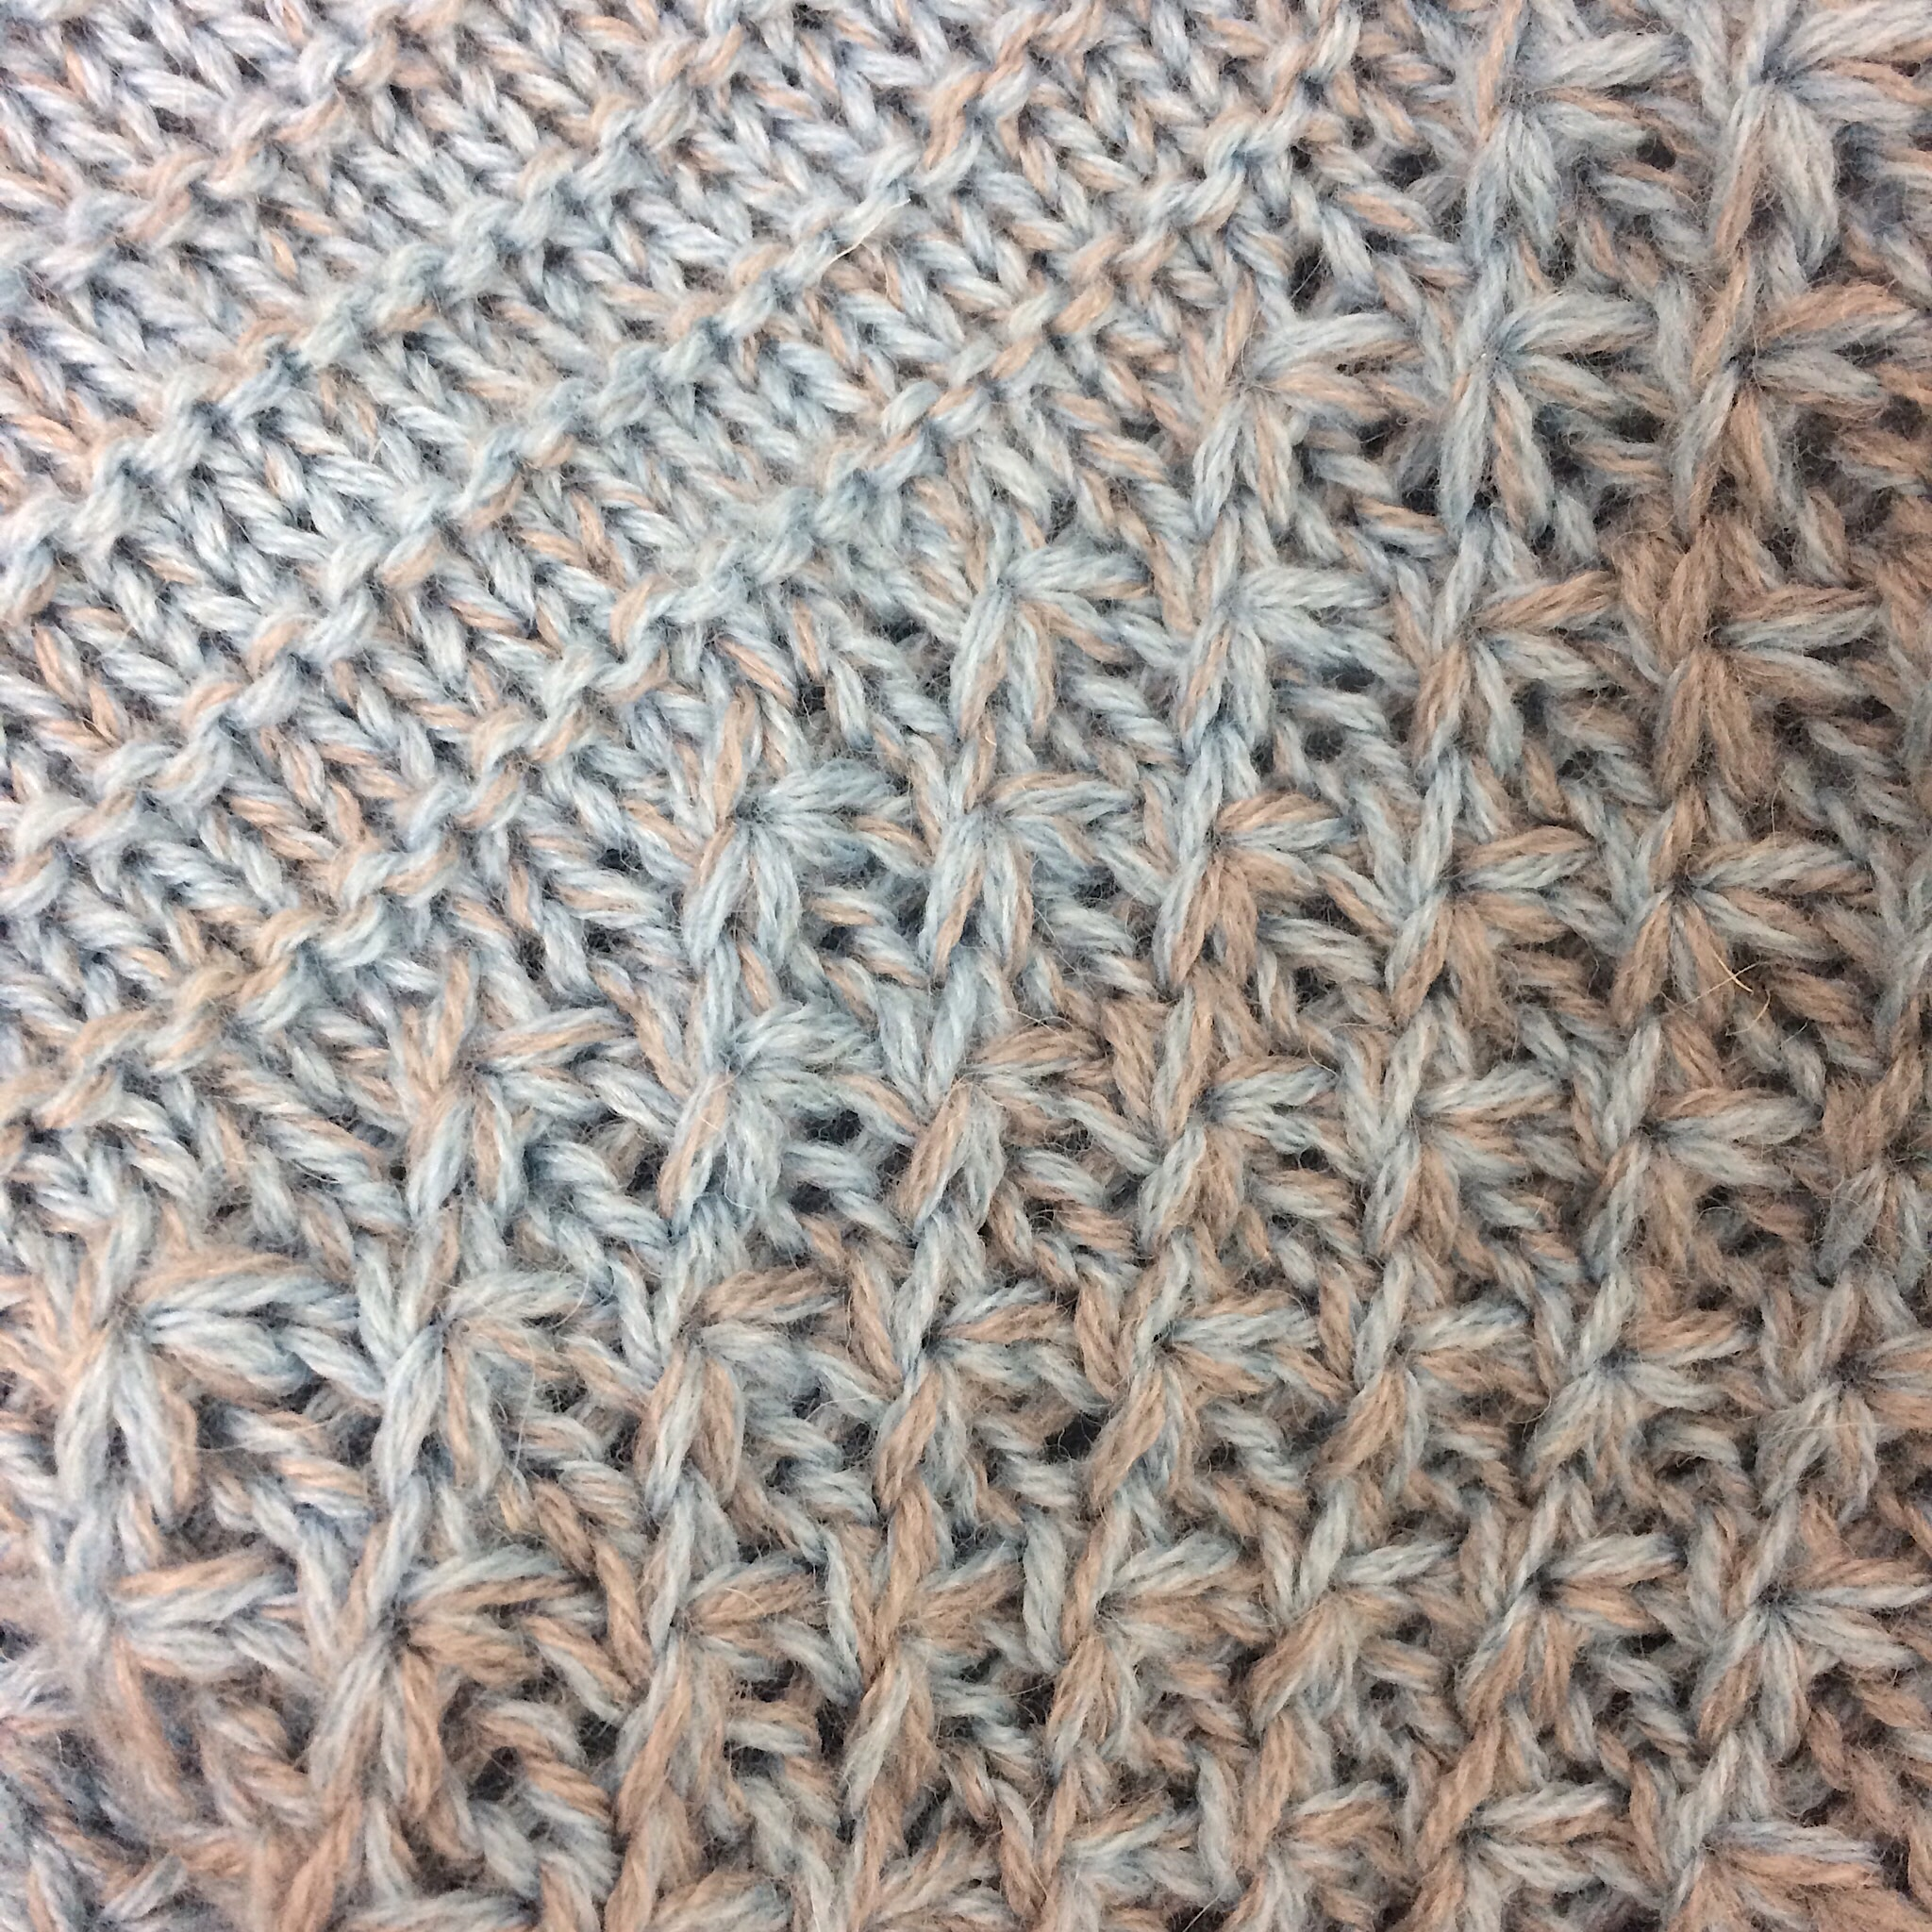 Dreieckstuch Im Mustermix Shades Of Alpaca Silk Glutenfreie